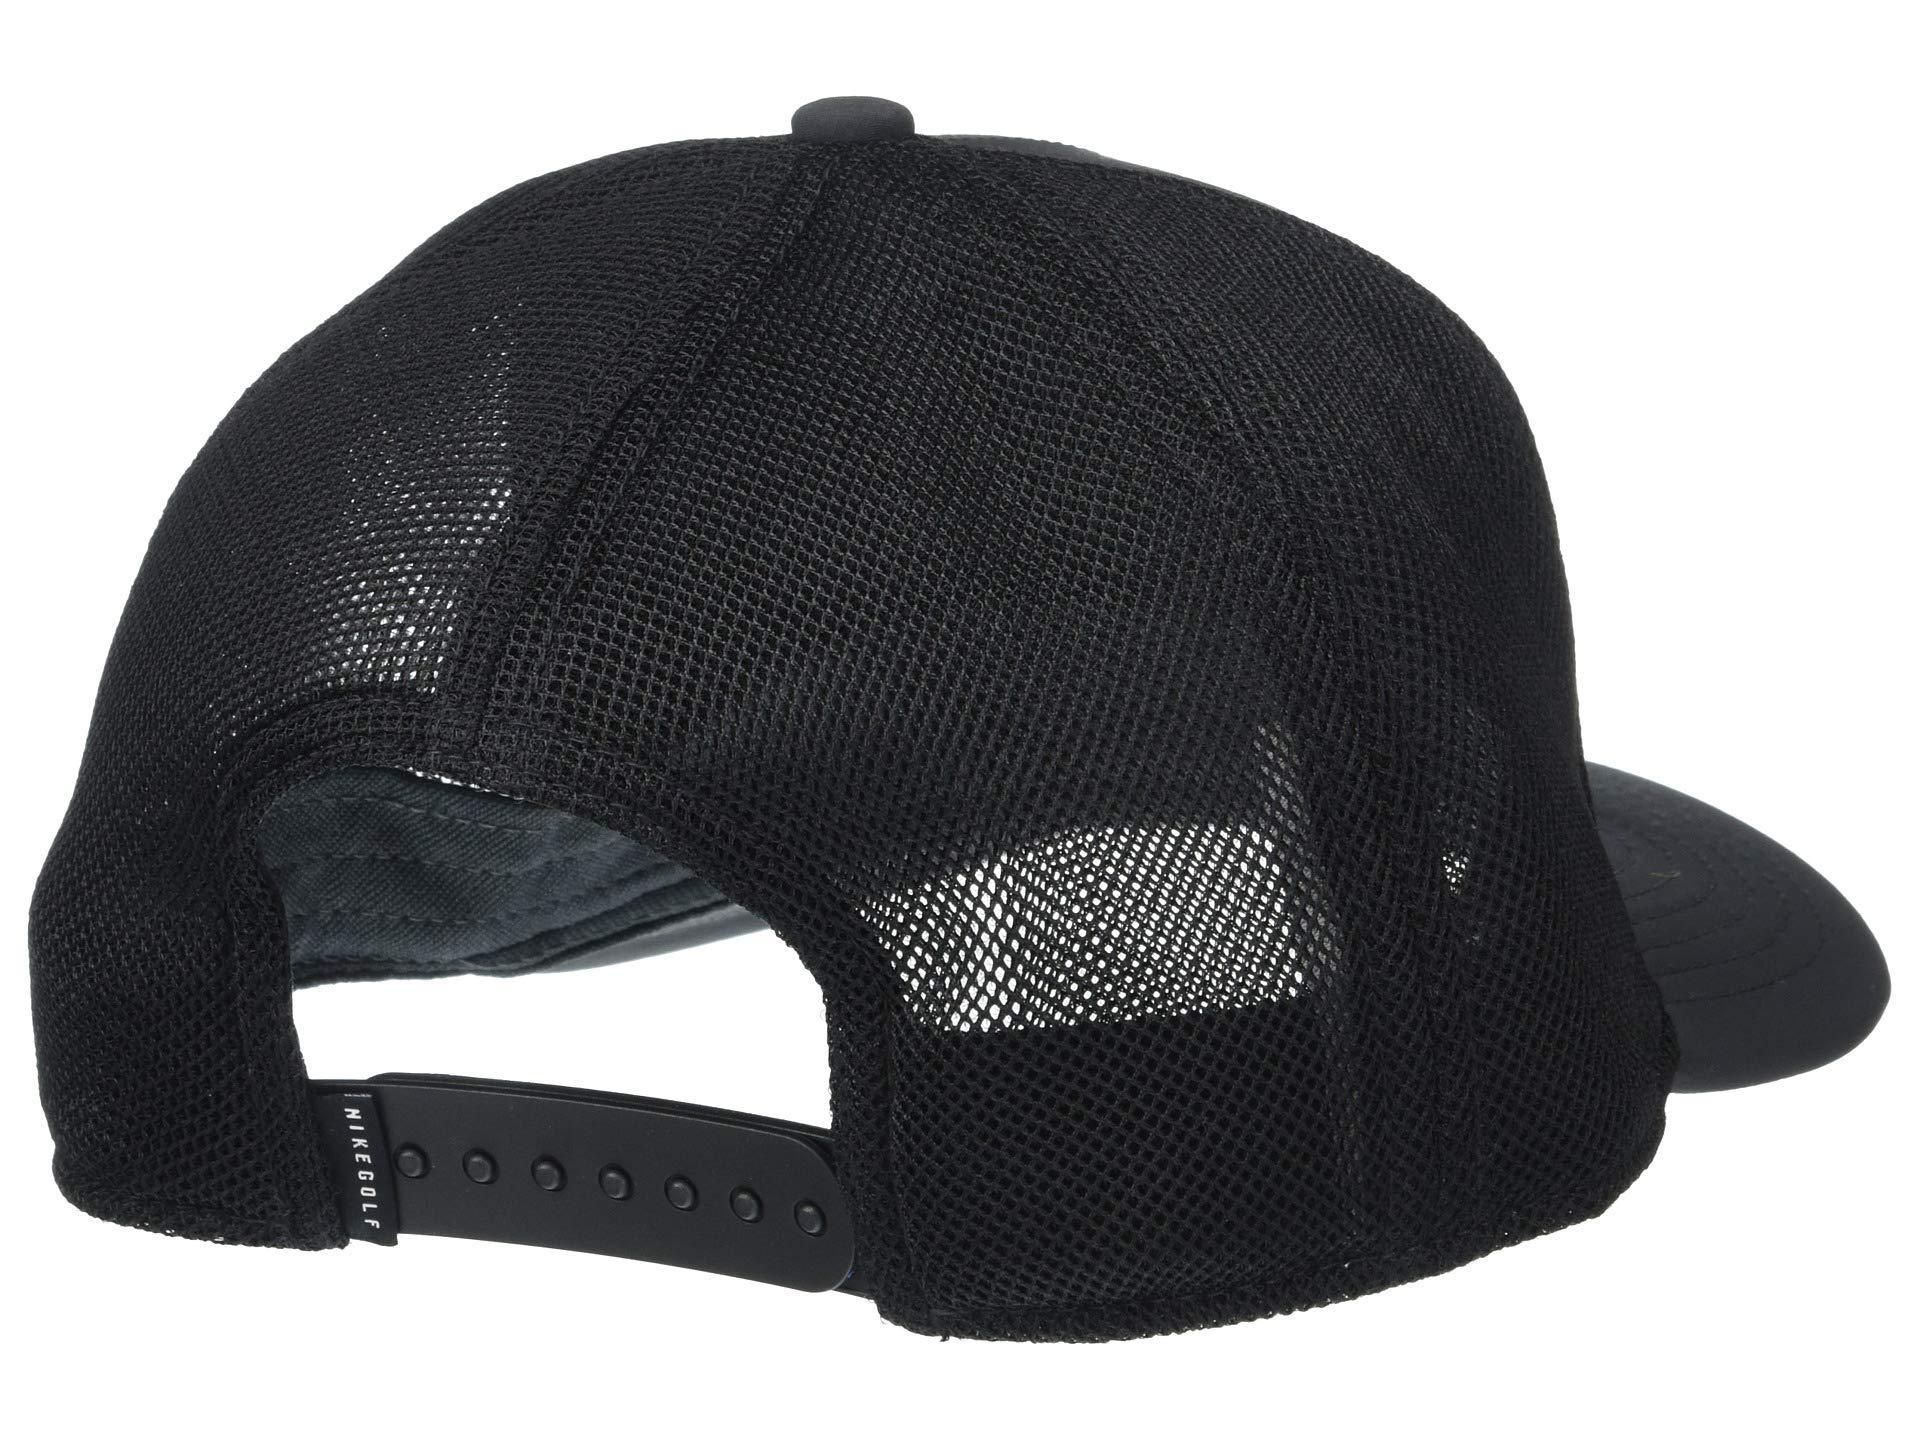 edef2d9f4daa8 Nike - Aerobill Classic99 Hat (black black white 2) Caps for Men. View  fullscreen